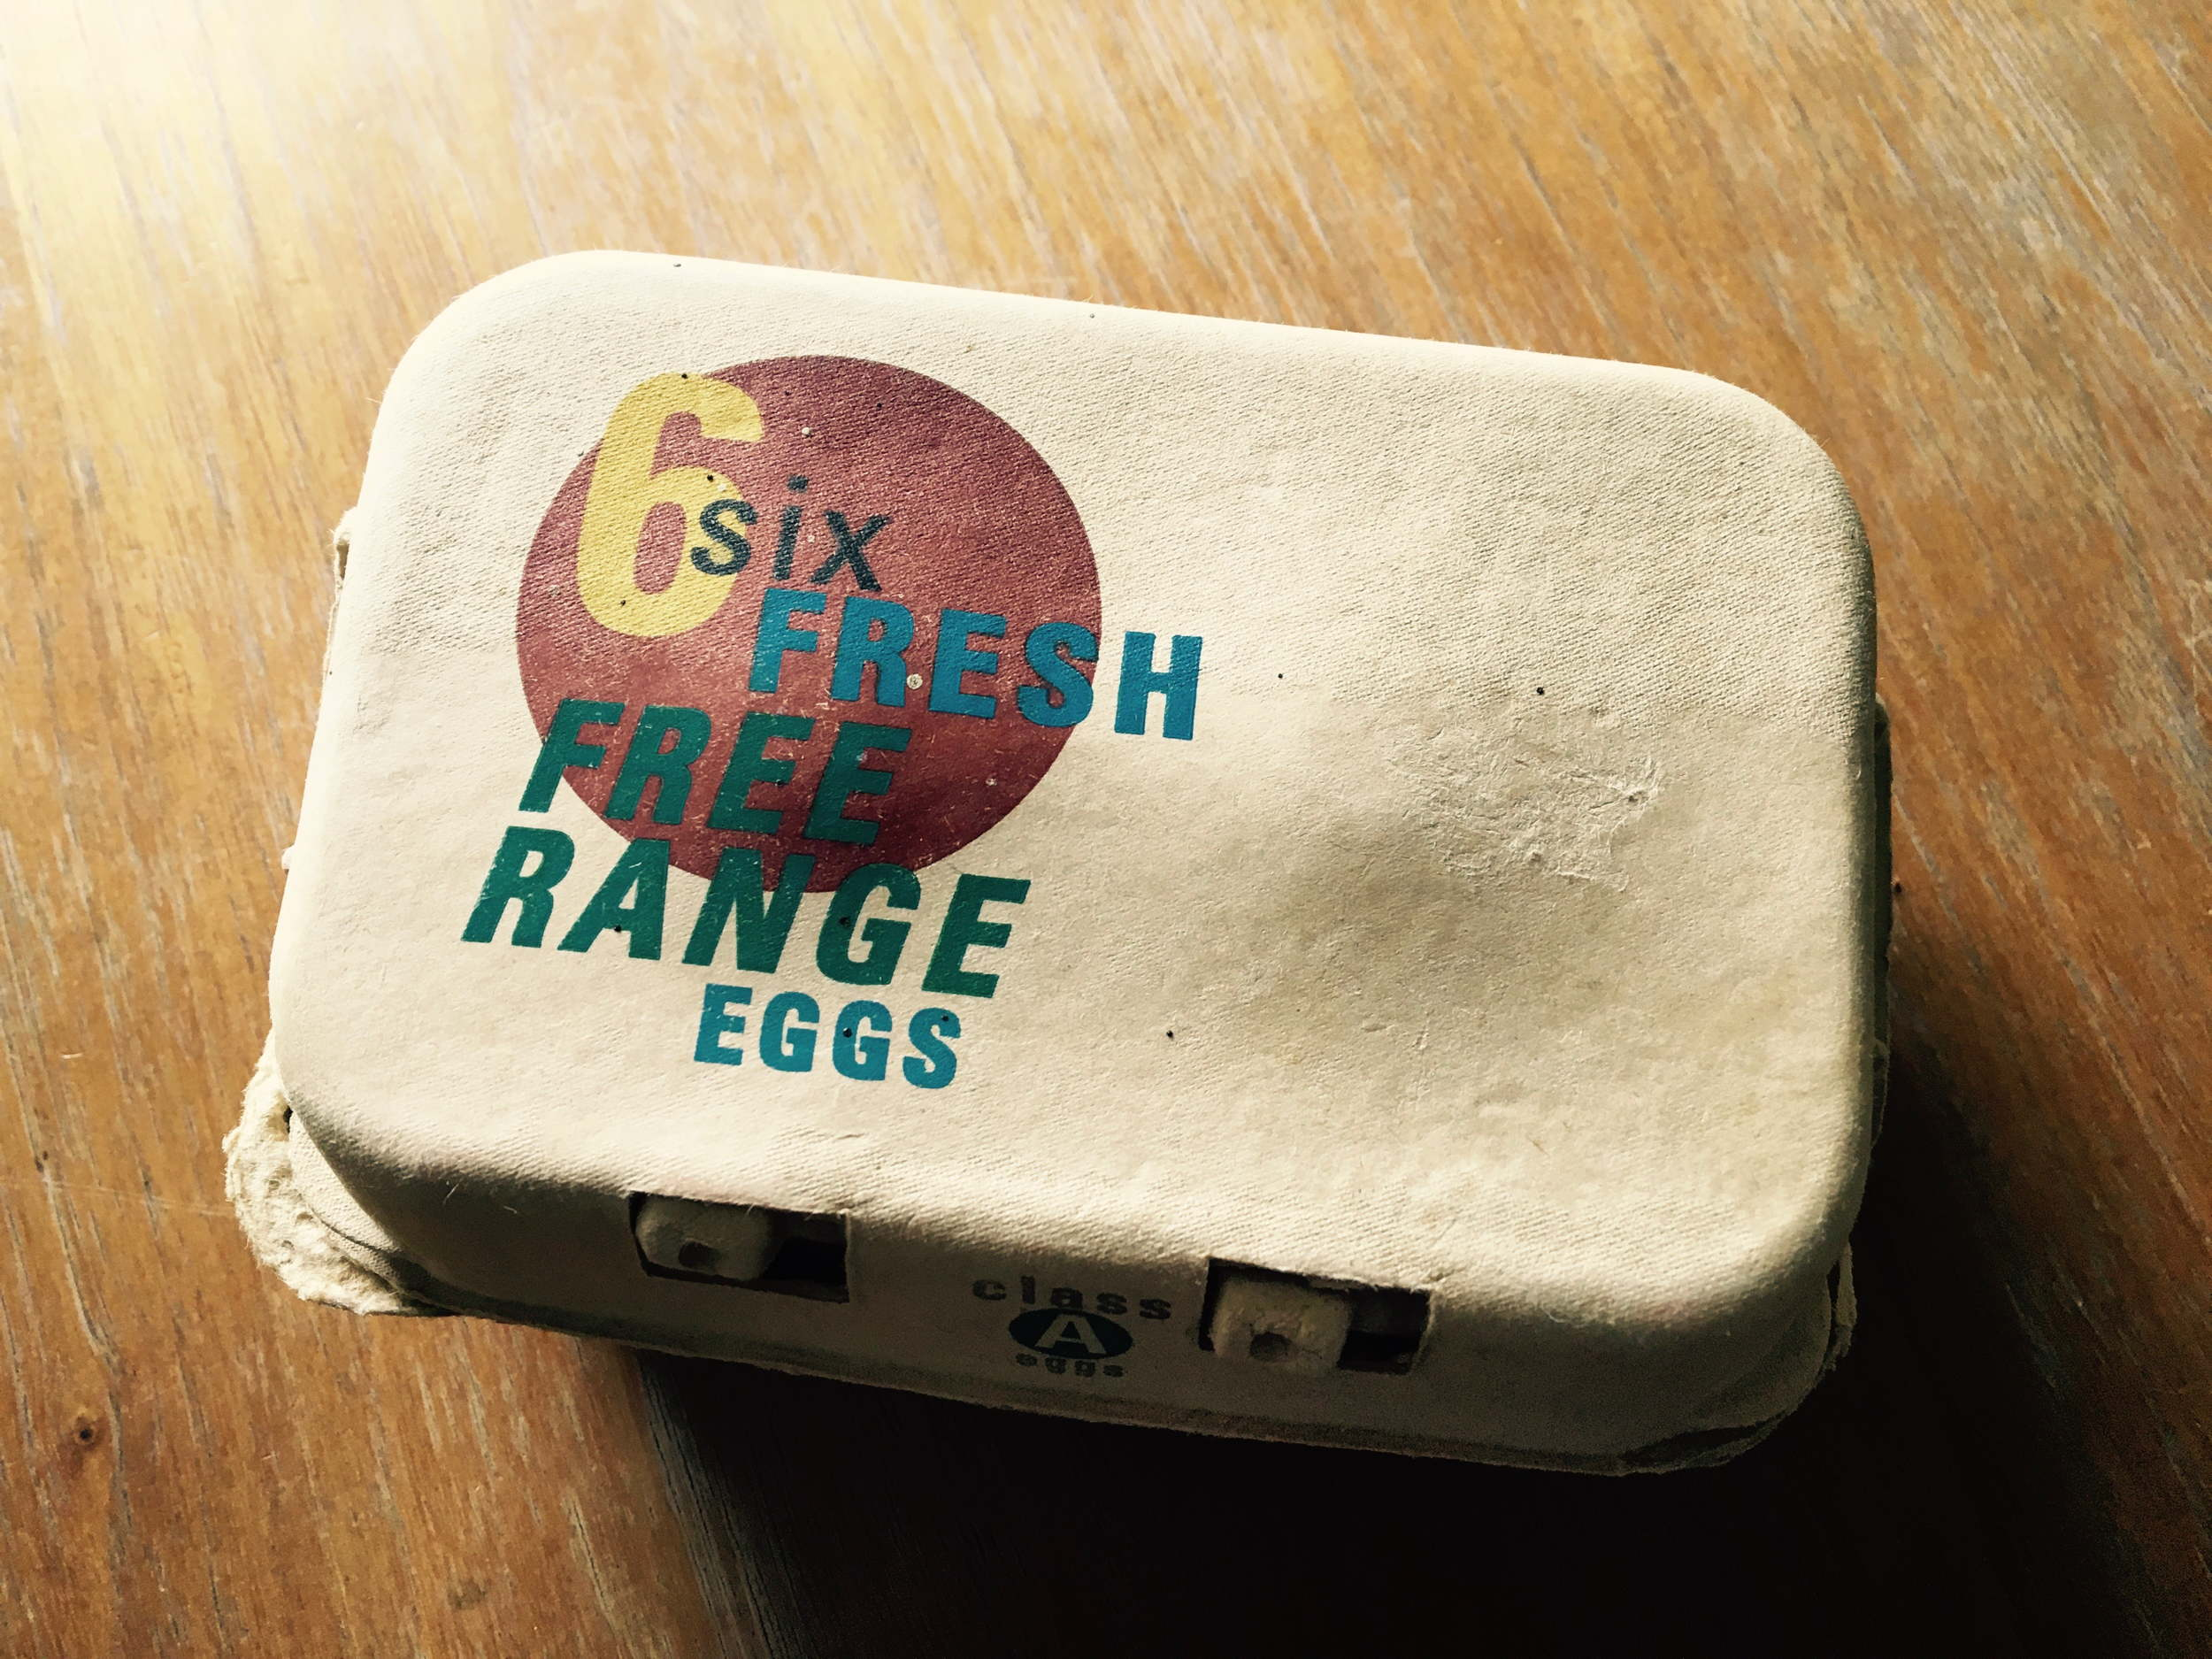 The egg box